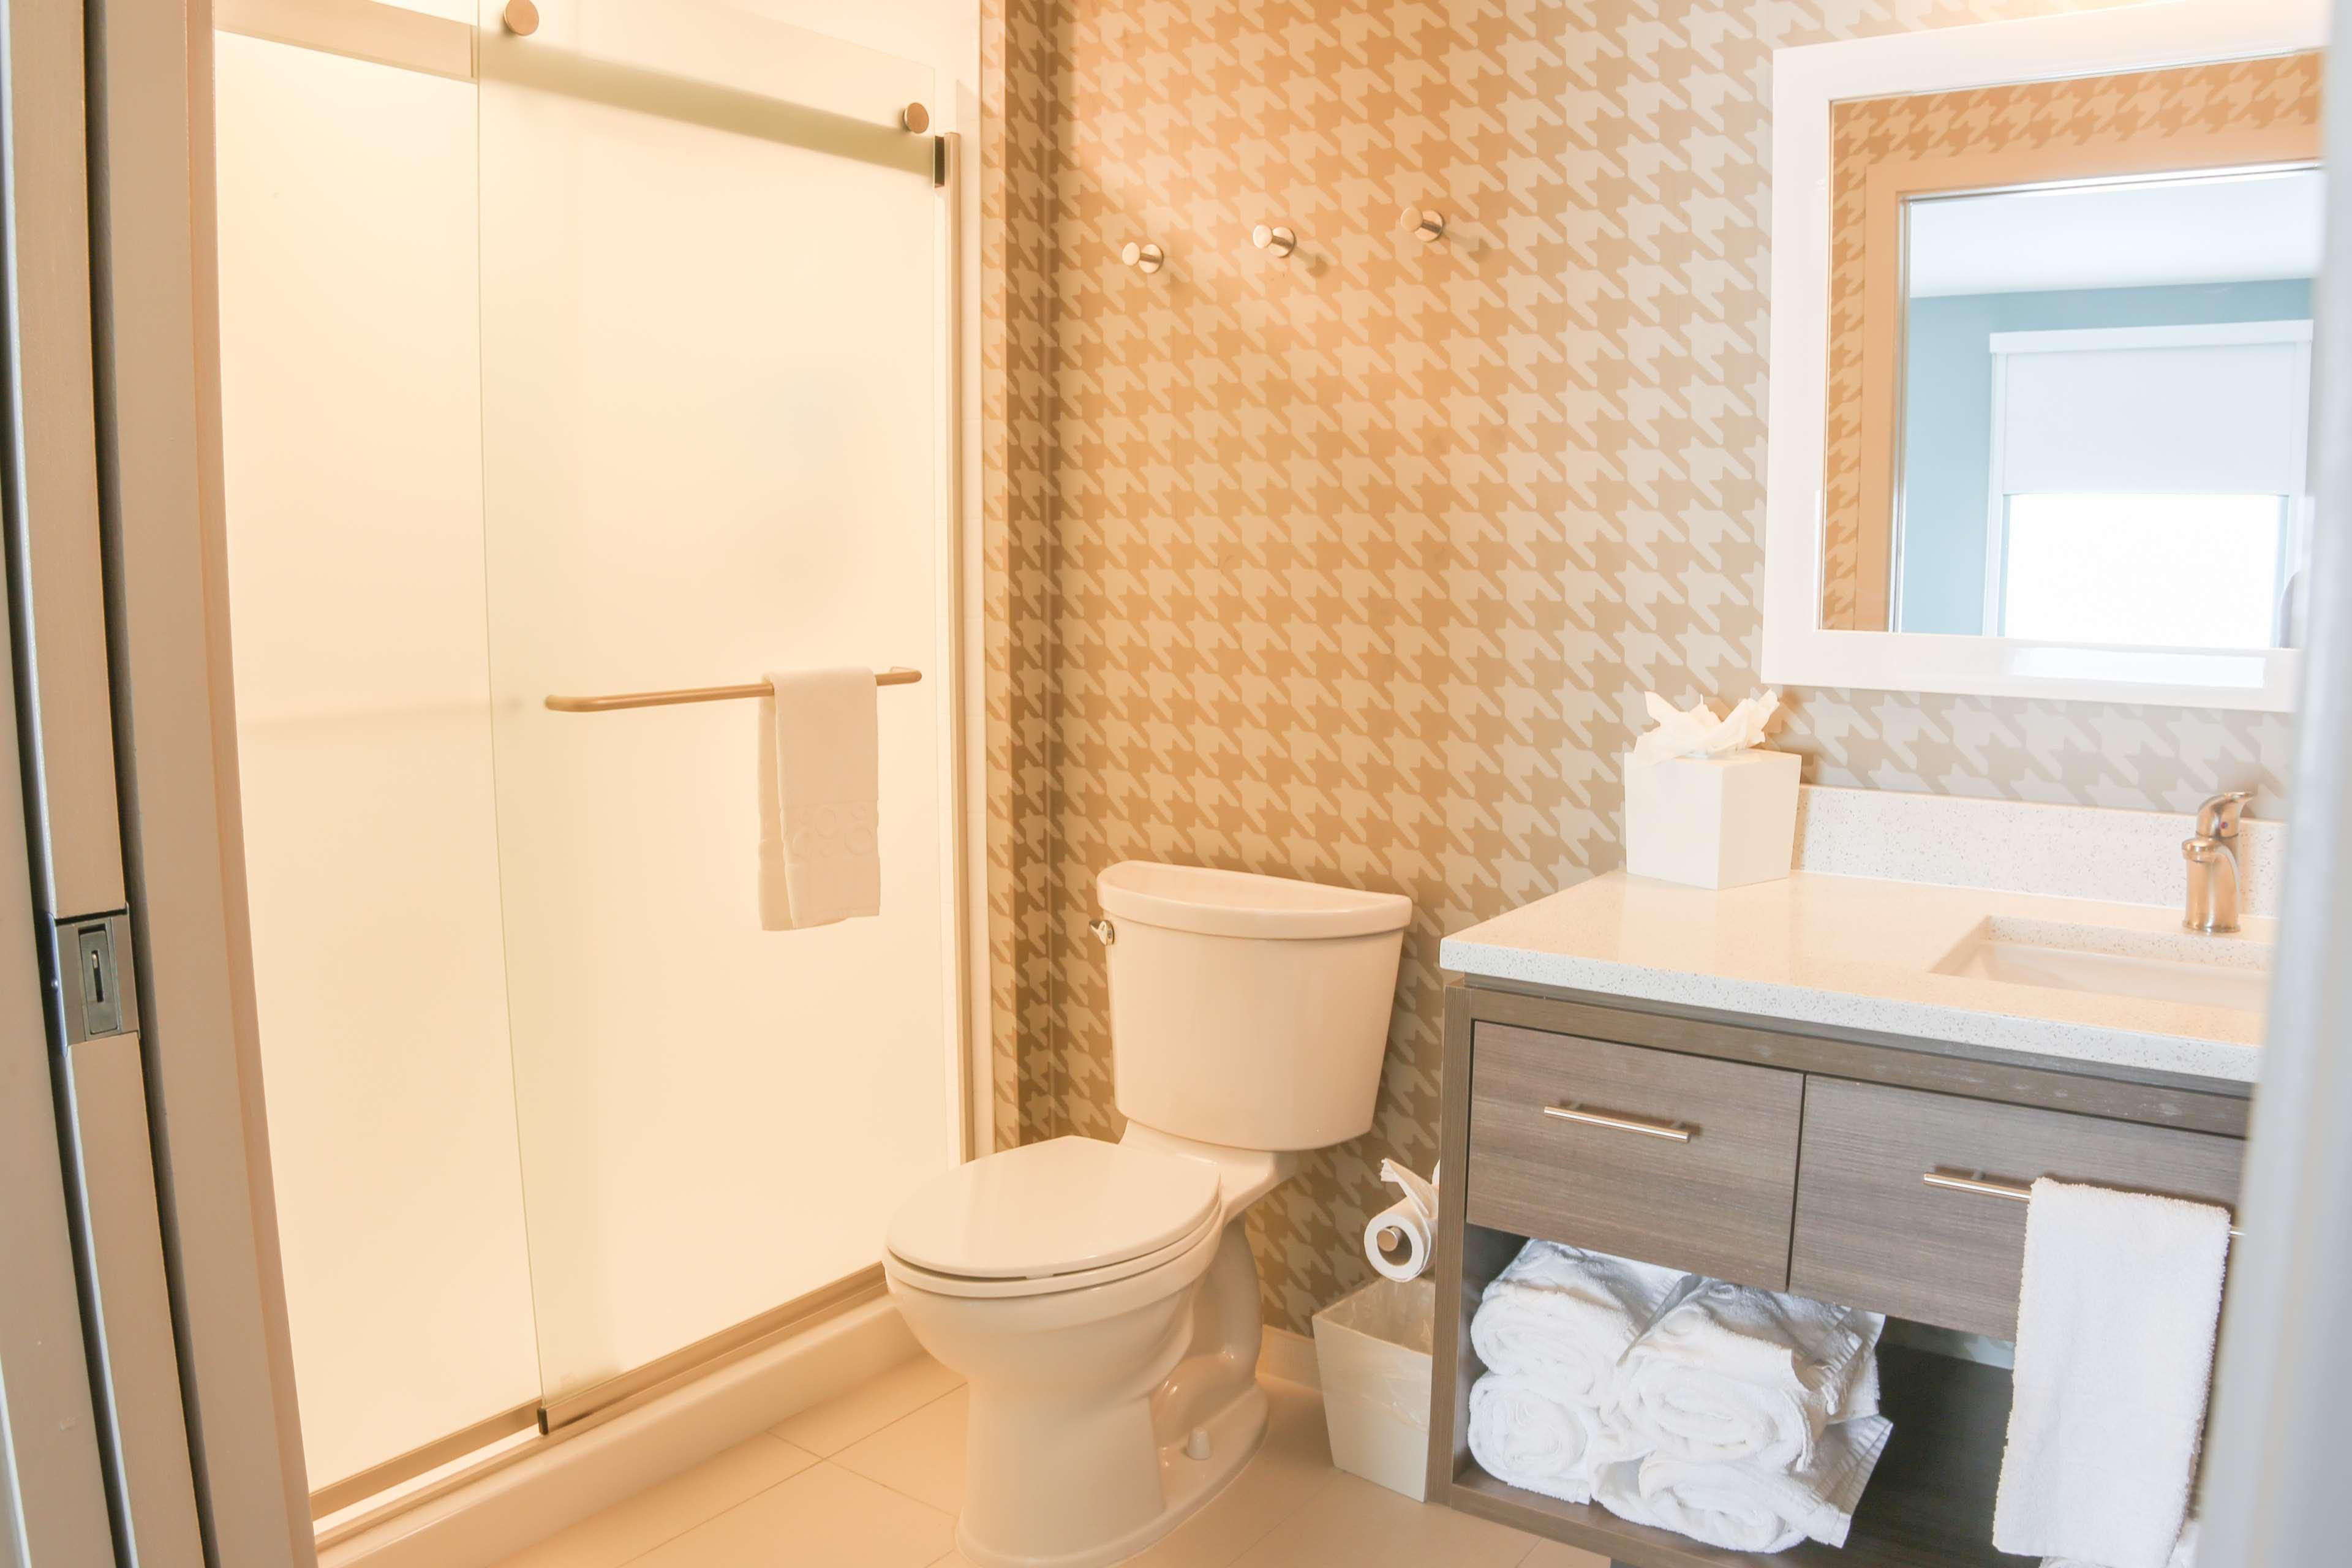 Home2 Suites by Hilton Bordentown image 22